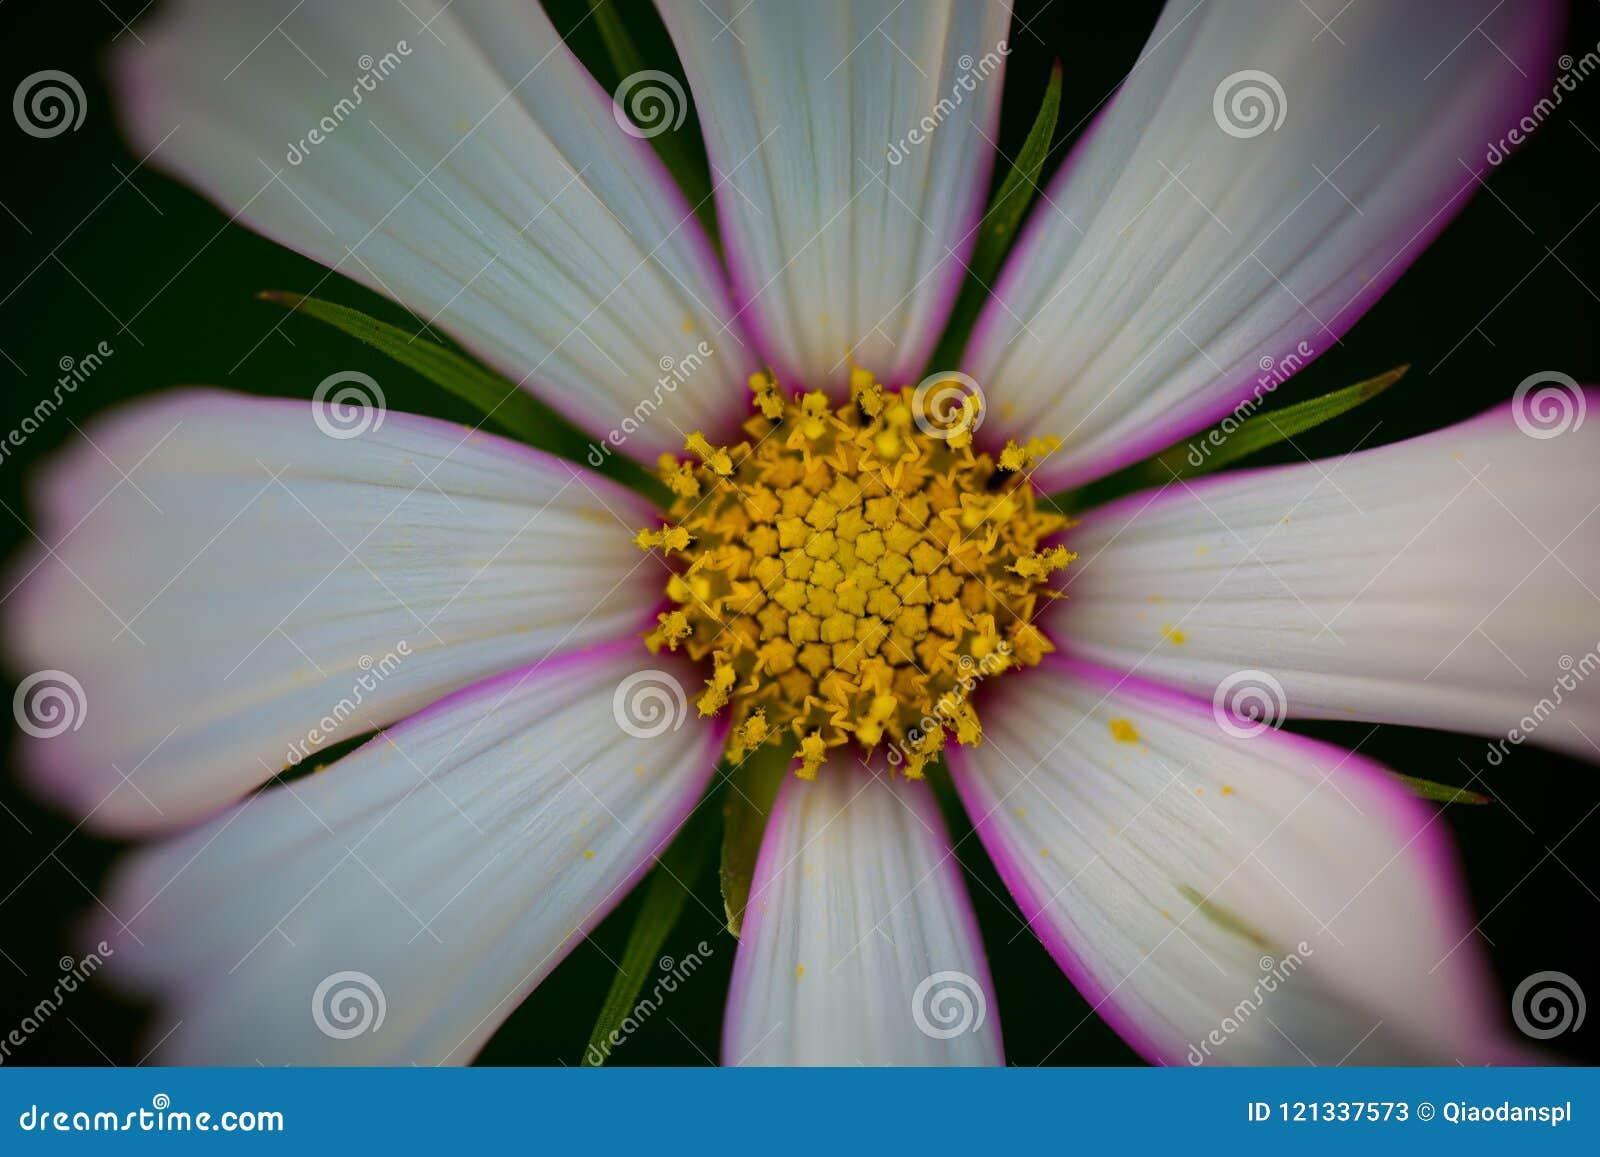 Cosmos bipinnata cav flower stock image image of eighteenth also cosmos bipinnata cav flower izmirmasajfo